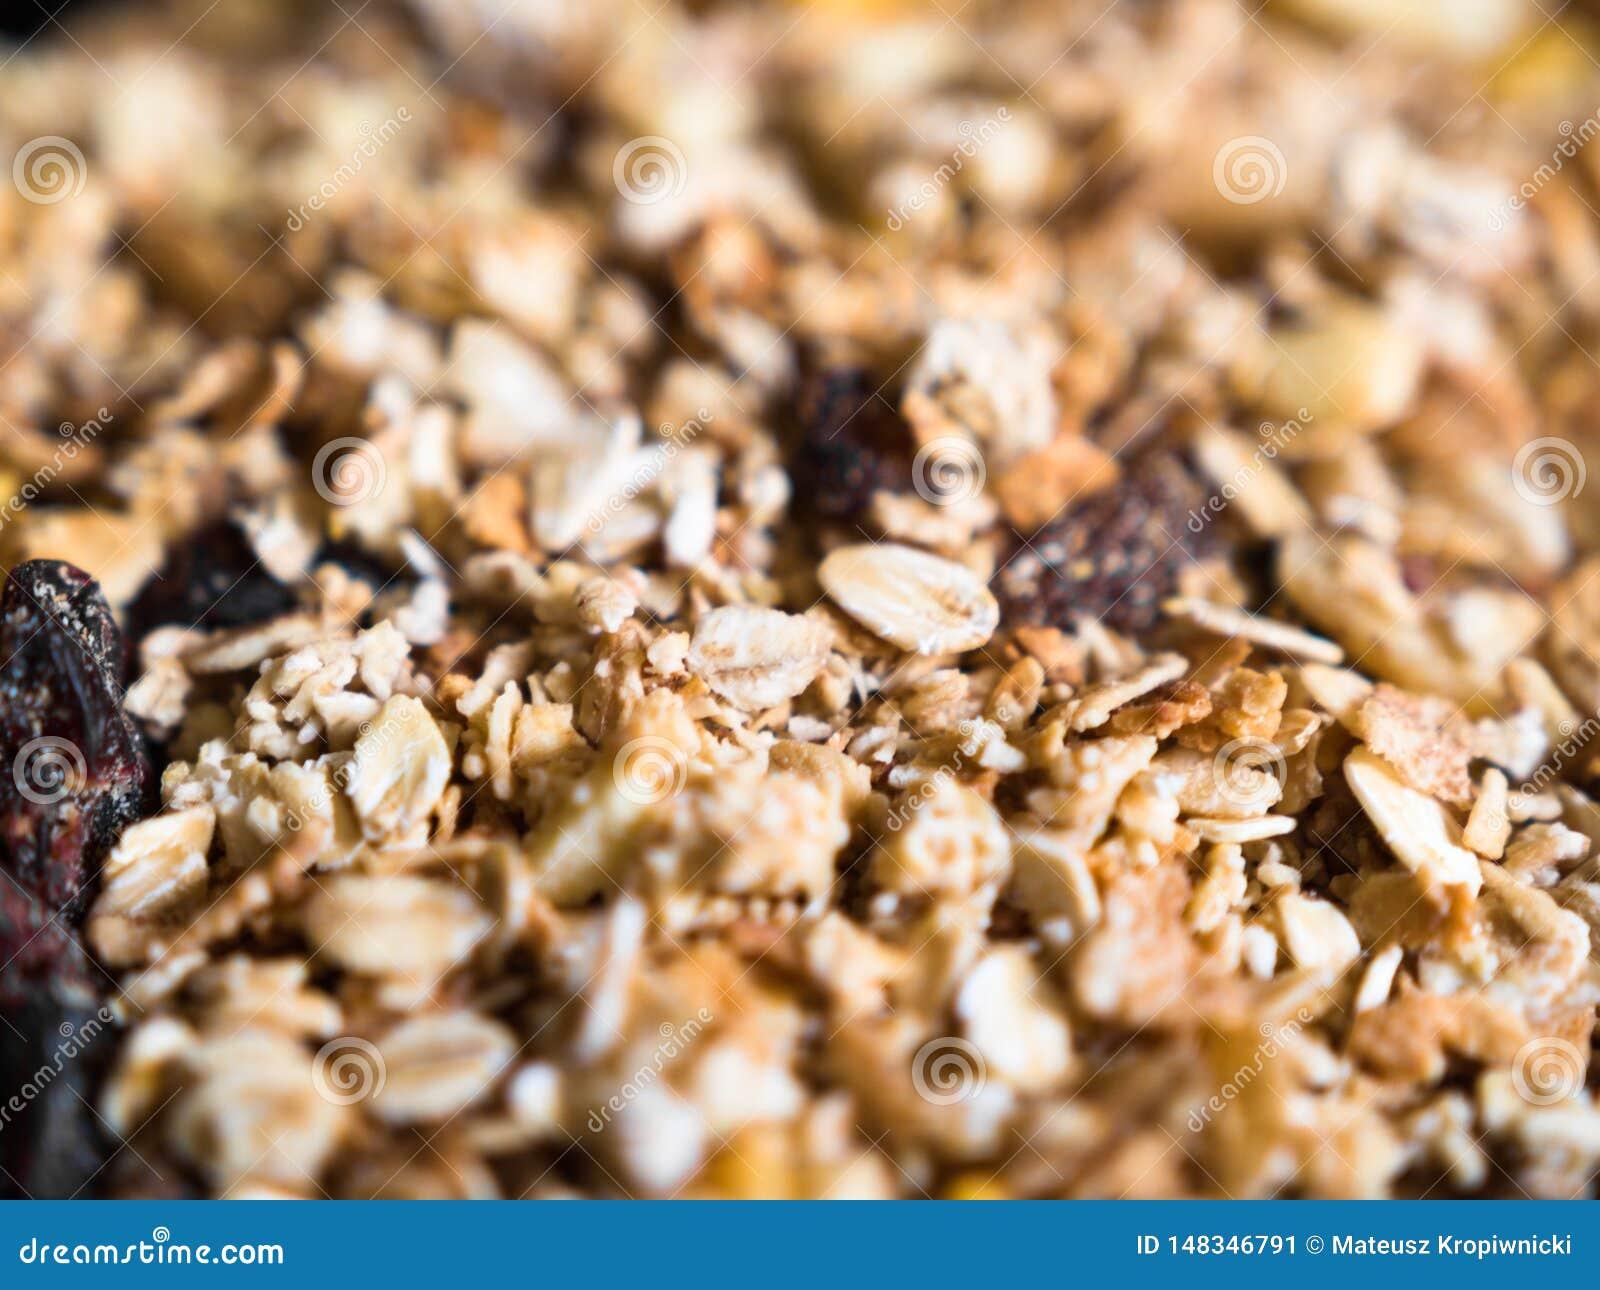 Plan rapproché de muesli croquant avec la granola et les fruits secs